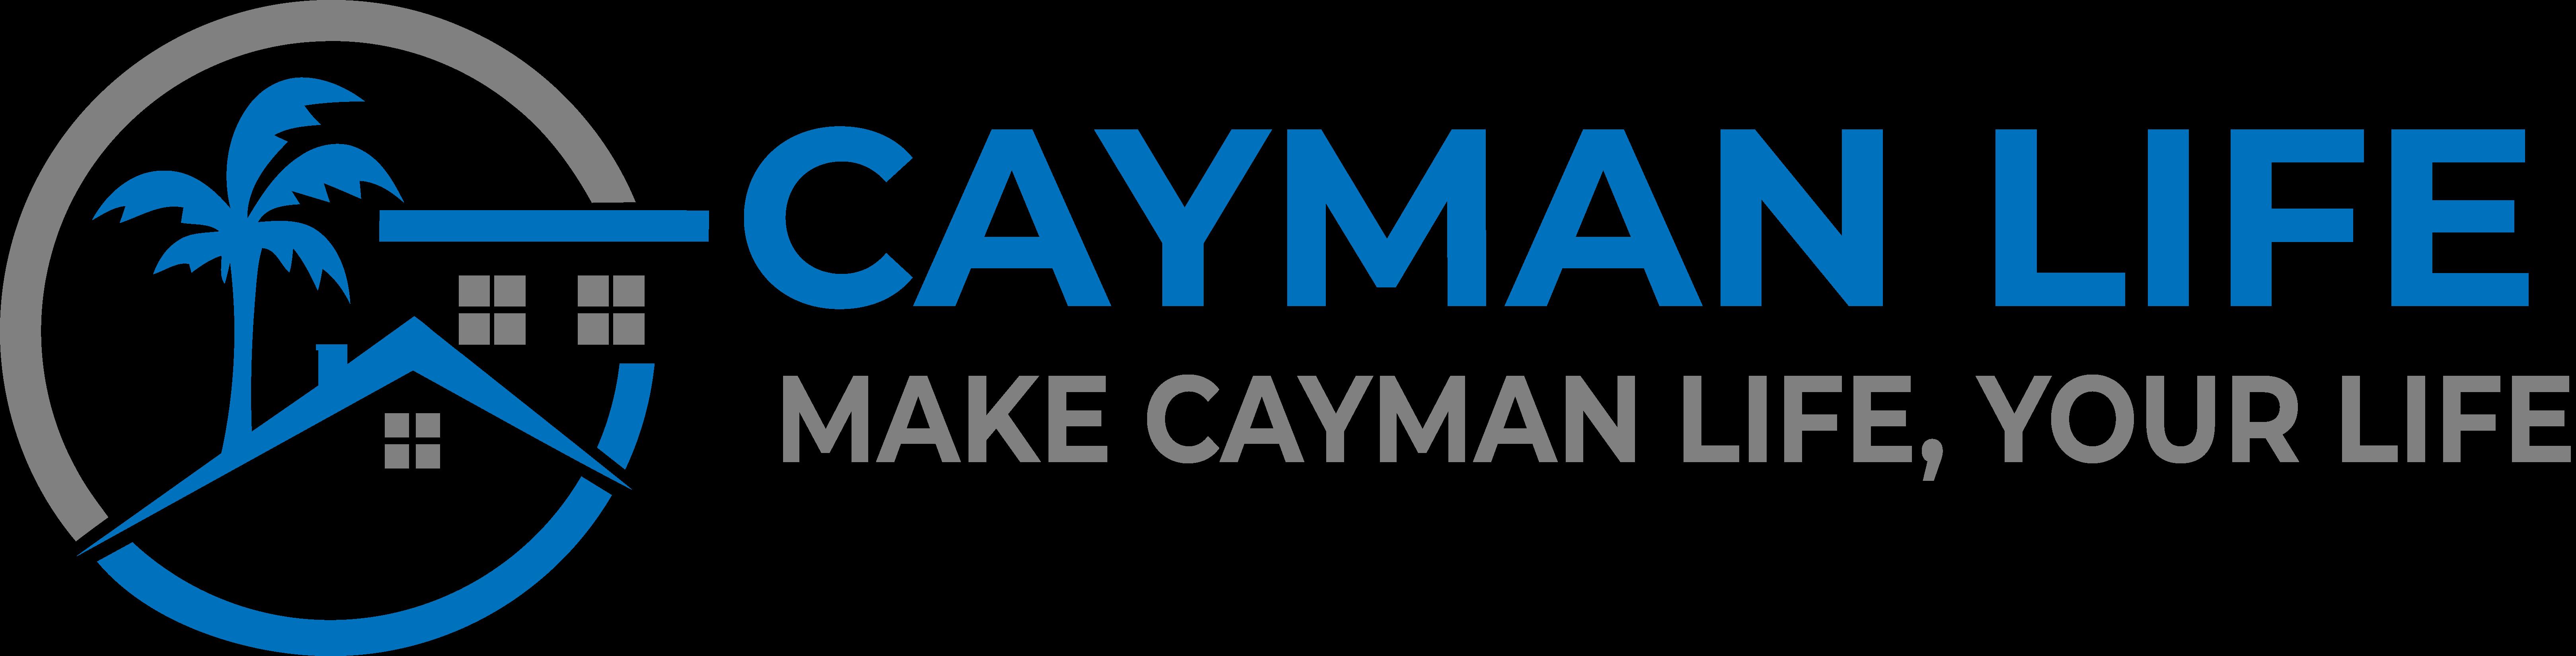 Cayman Life